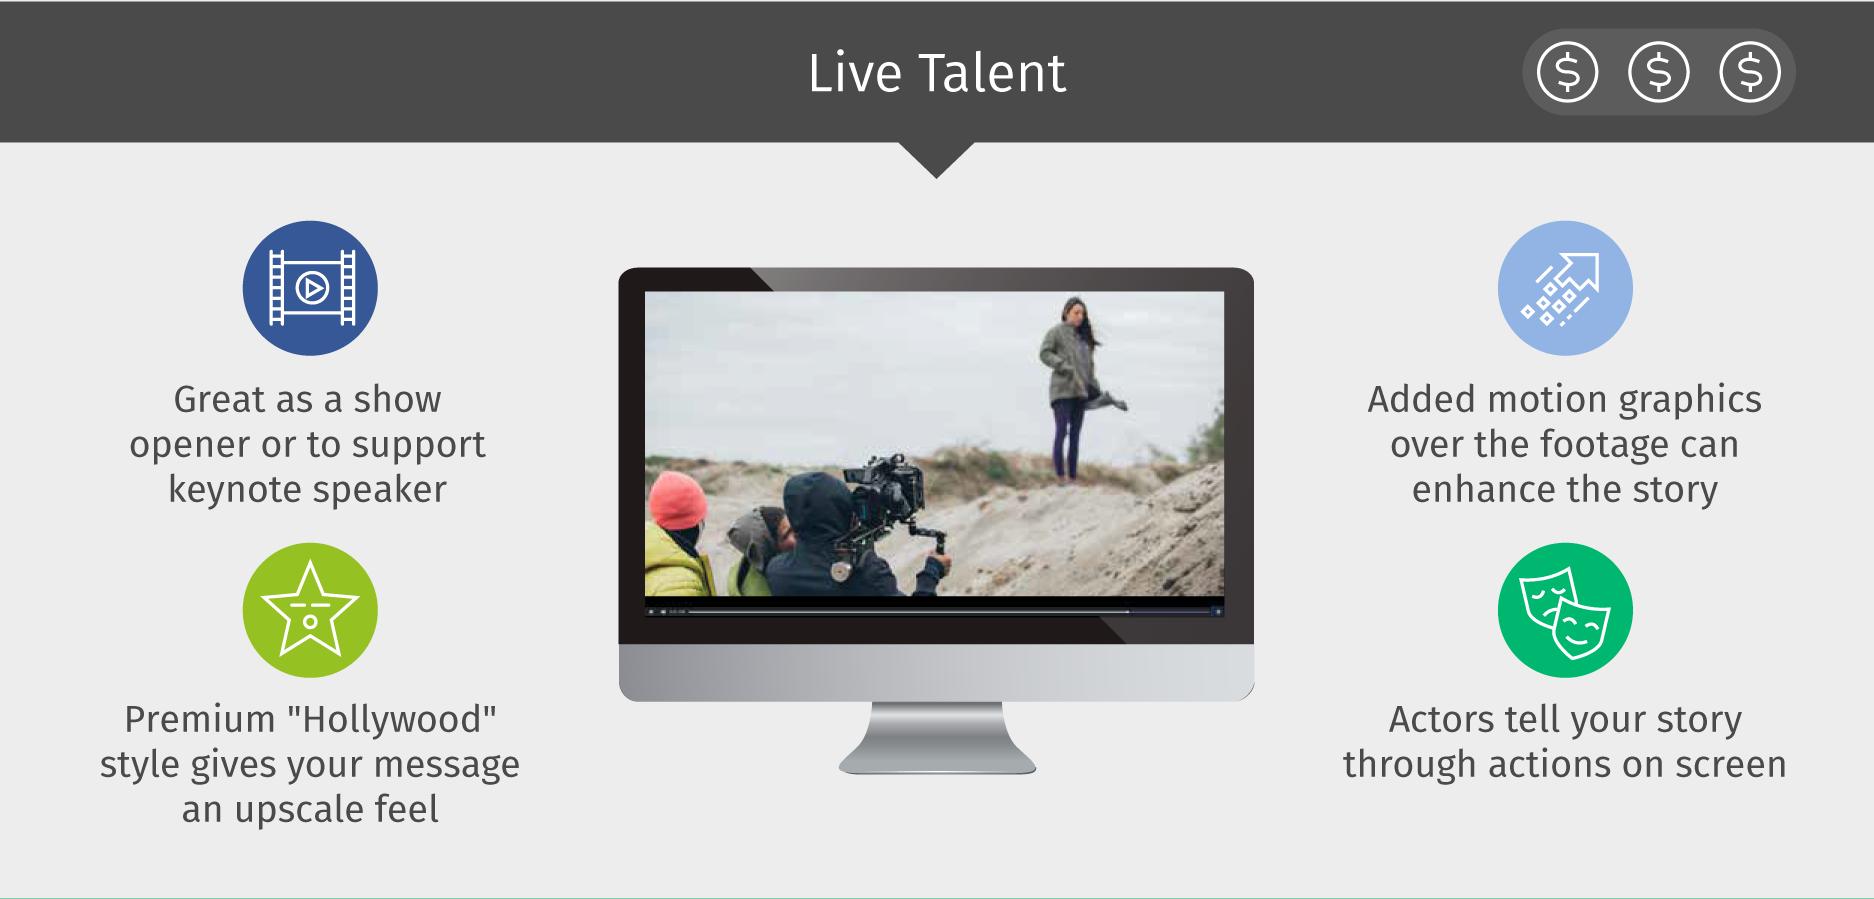 Live Talent